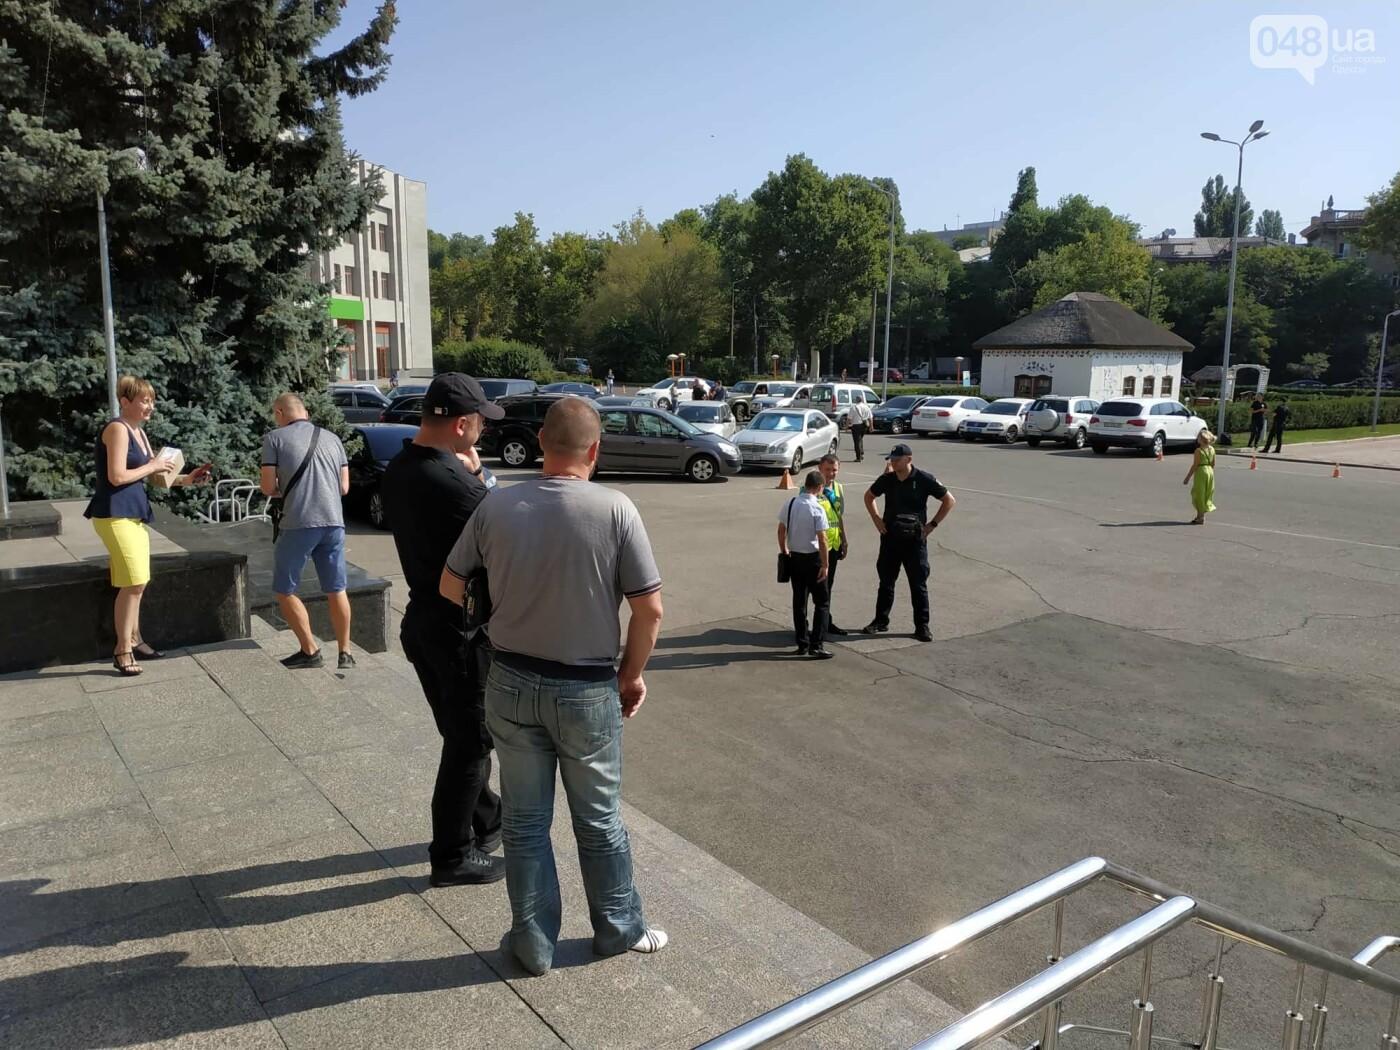 Стало известно, кто возглавил Одесский областной совет, - ФОТО, фото-2, Фото: Александр Жирносенко